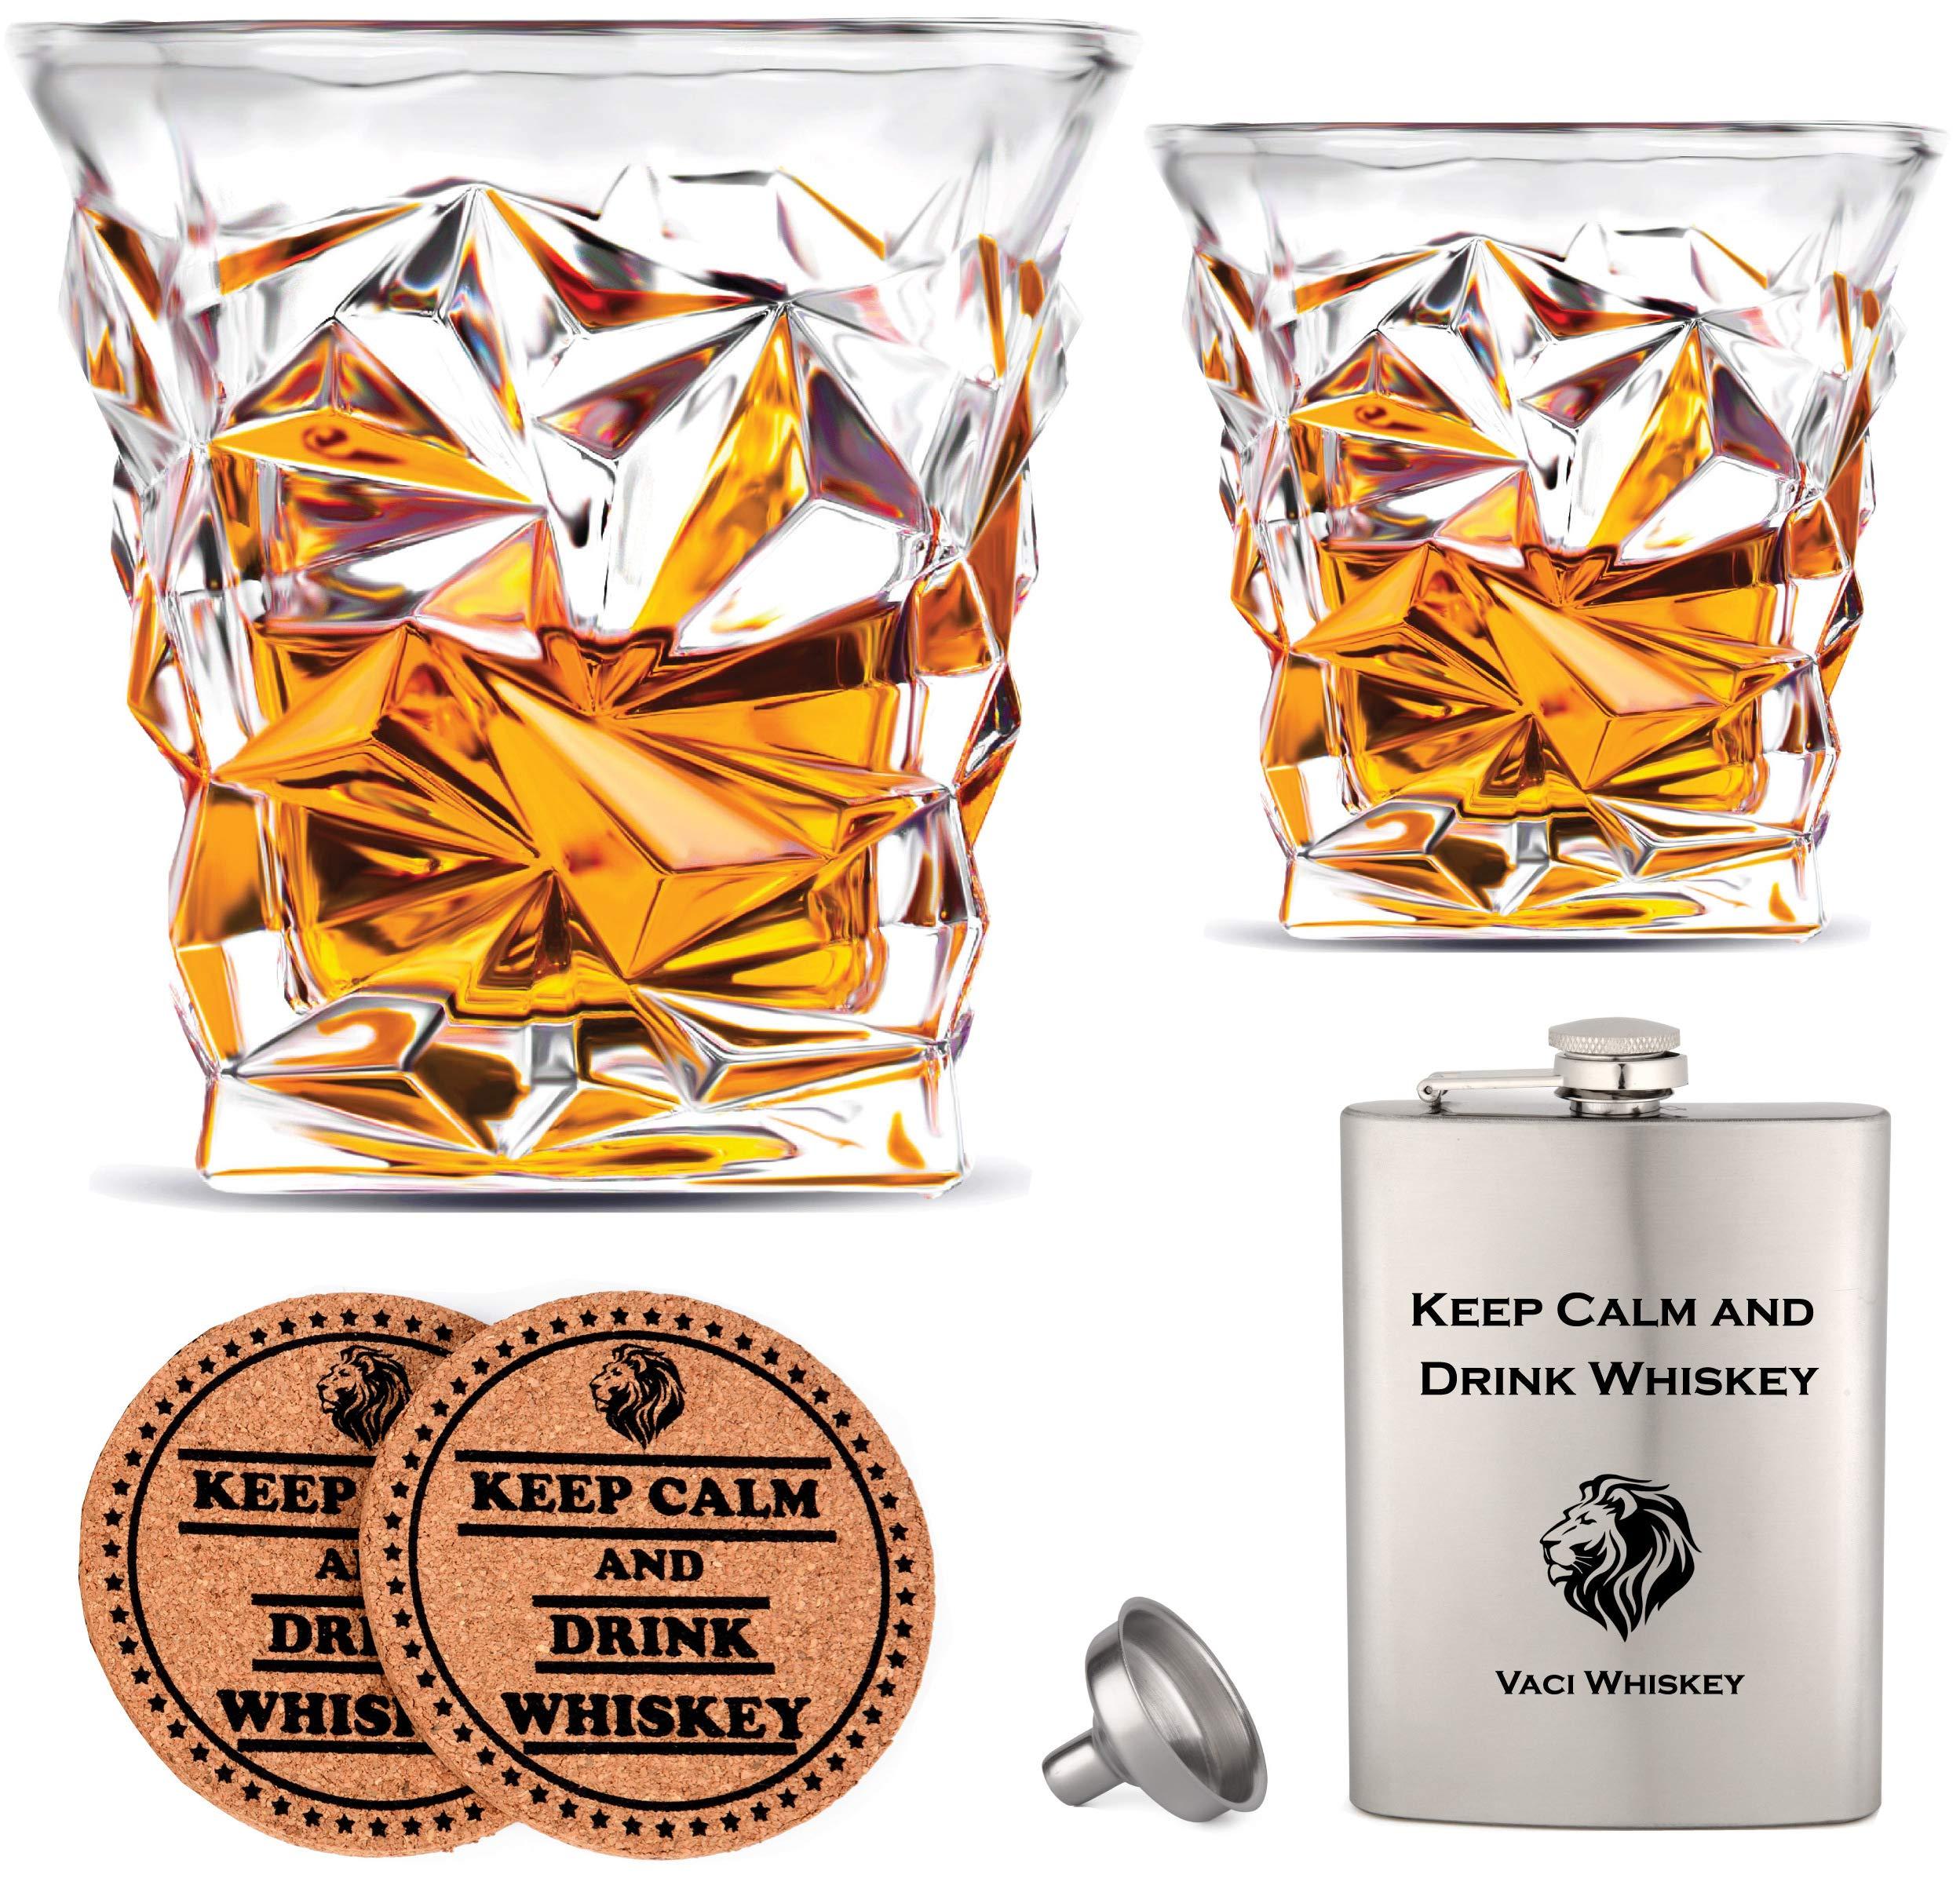 Vaci Crystal Whiskey Glasses – Set of 2 Bourbon Glasses, Tumblers for Drinking Scotch, Cognac, Irish Whisky, Large 10oz…